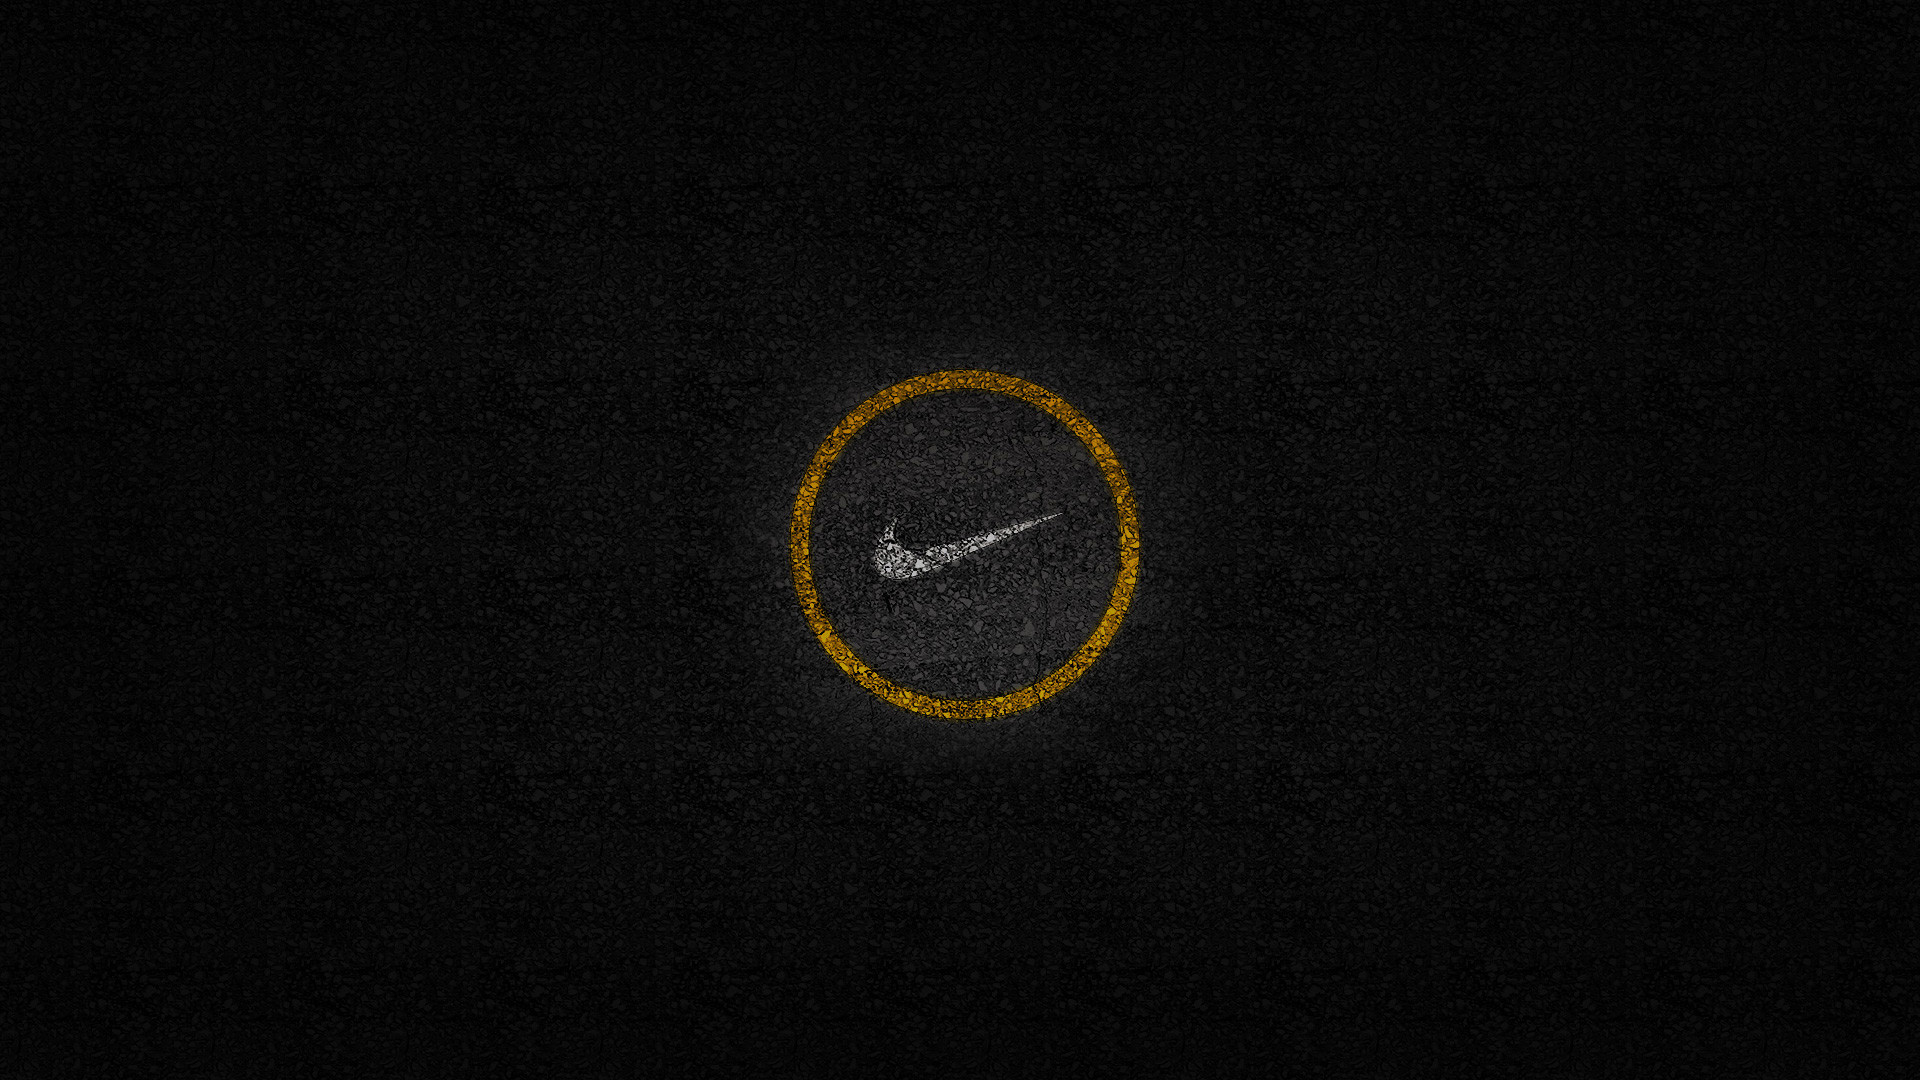 Hd Supreme Wallpaper Iphone X Nike Wallpaper Logo 64 Images